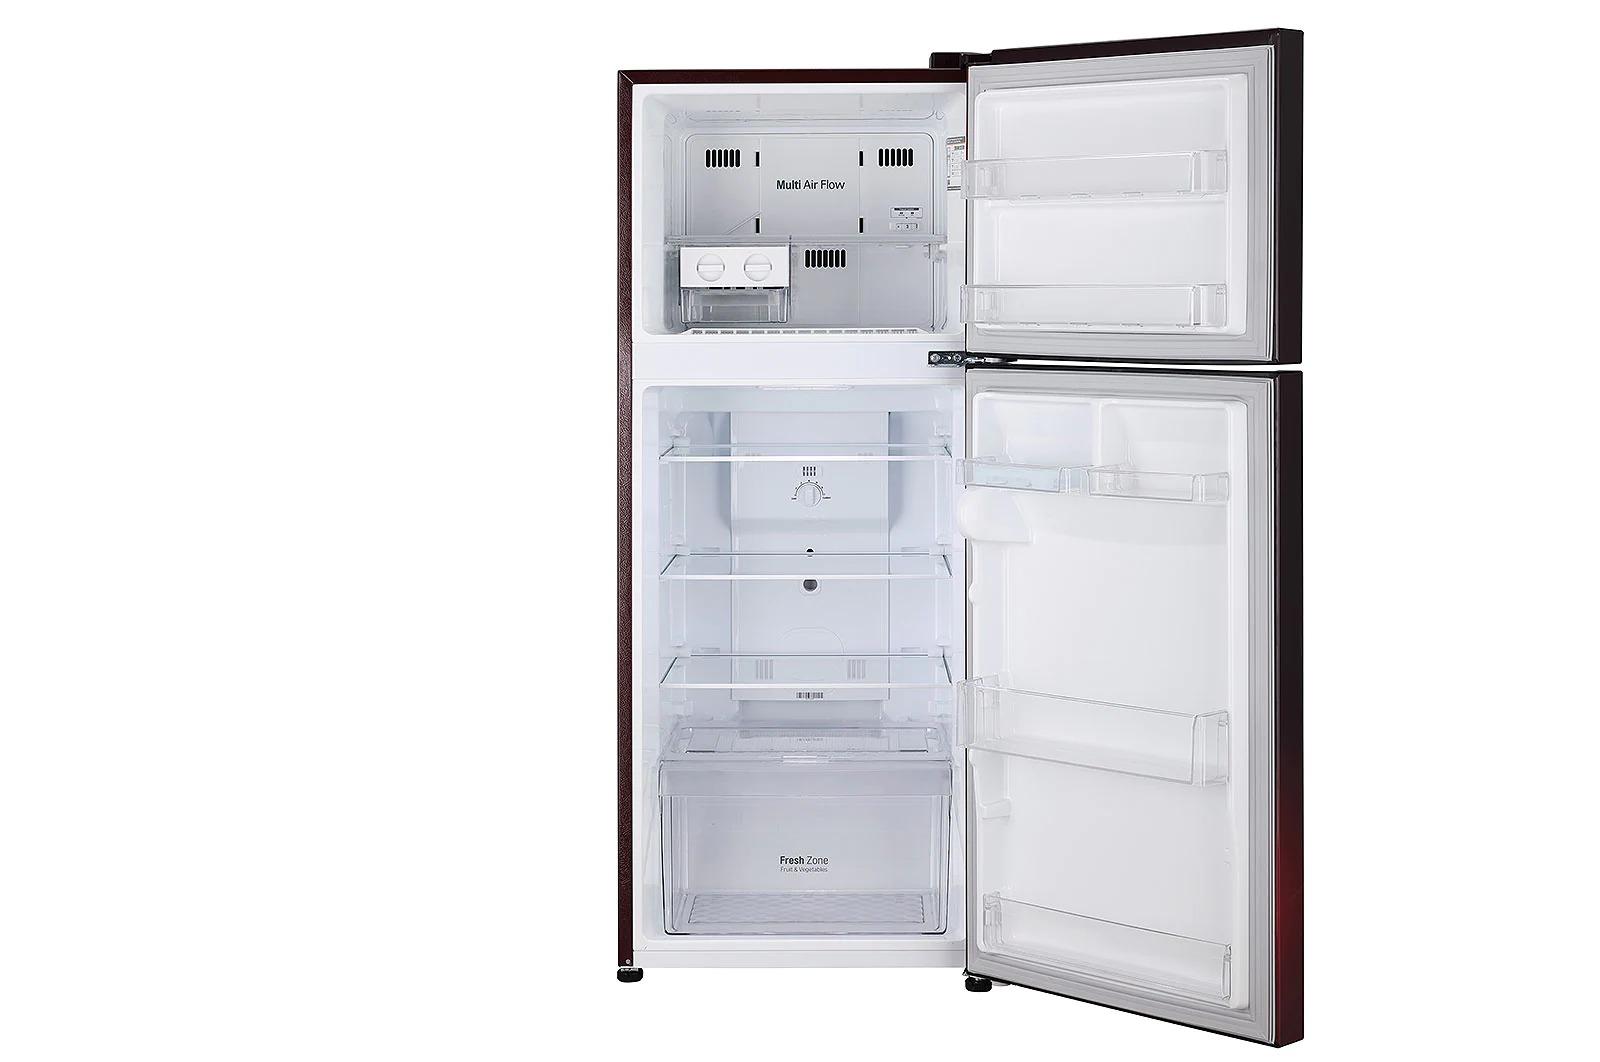 LG (GL-N292DSPY) 260 Litres Frost Free Refrigerator With Smart Inverter Compressor, Multi Air Flow, LED Lighting, MOIST 'N' FRESH